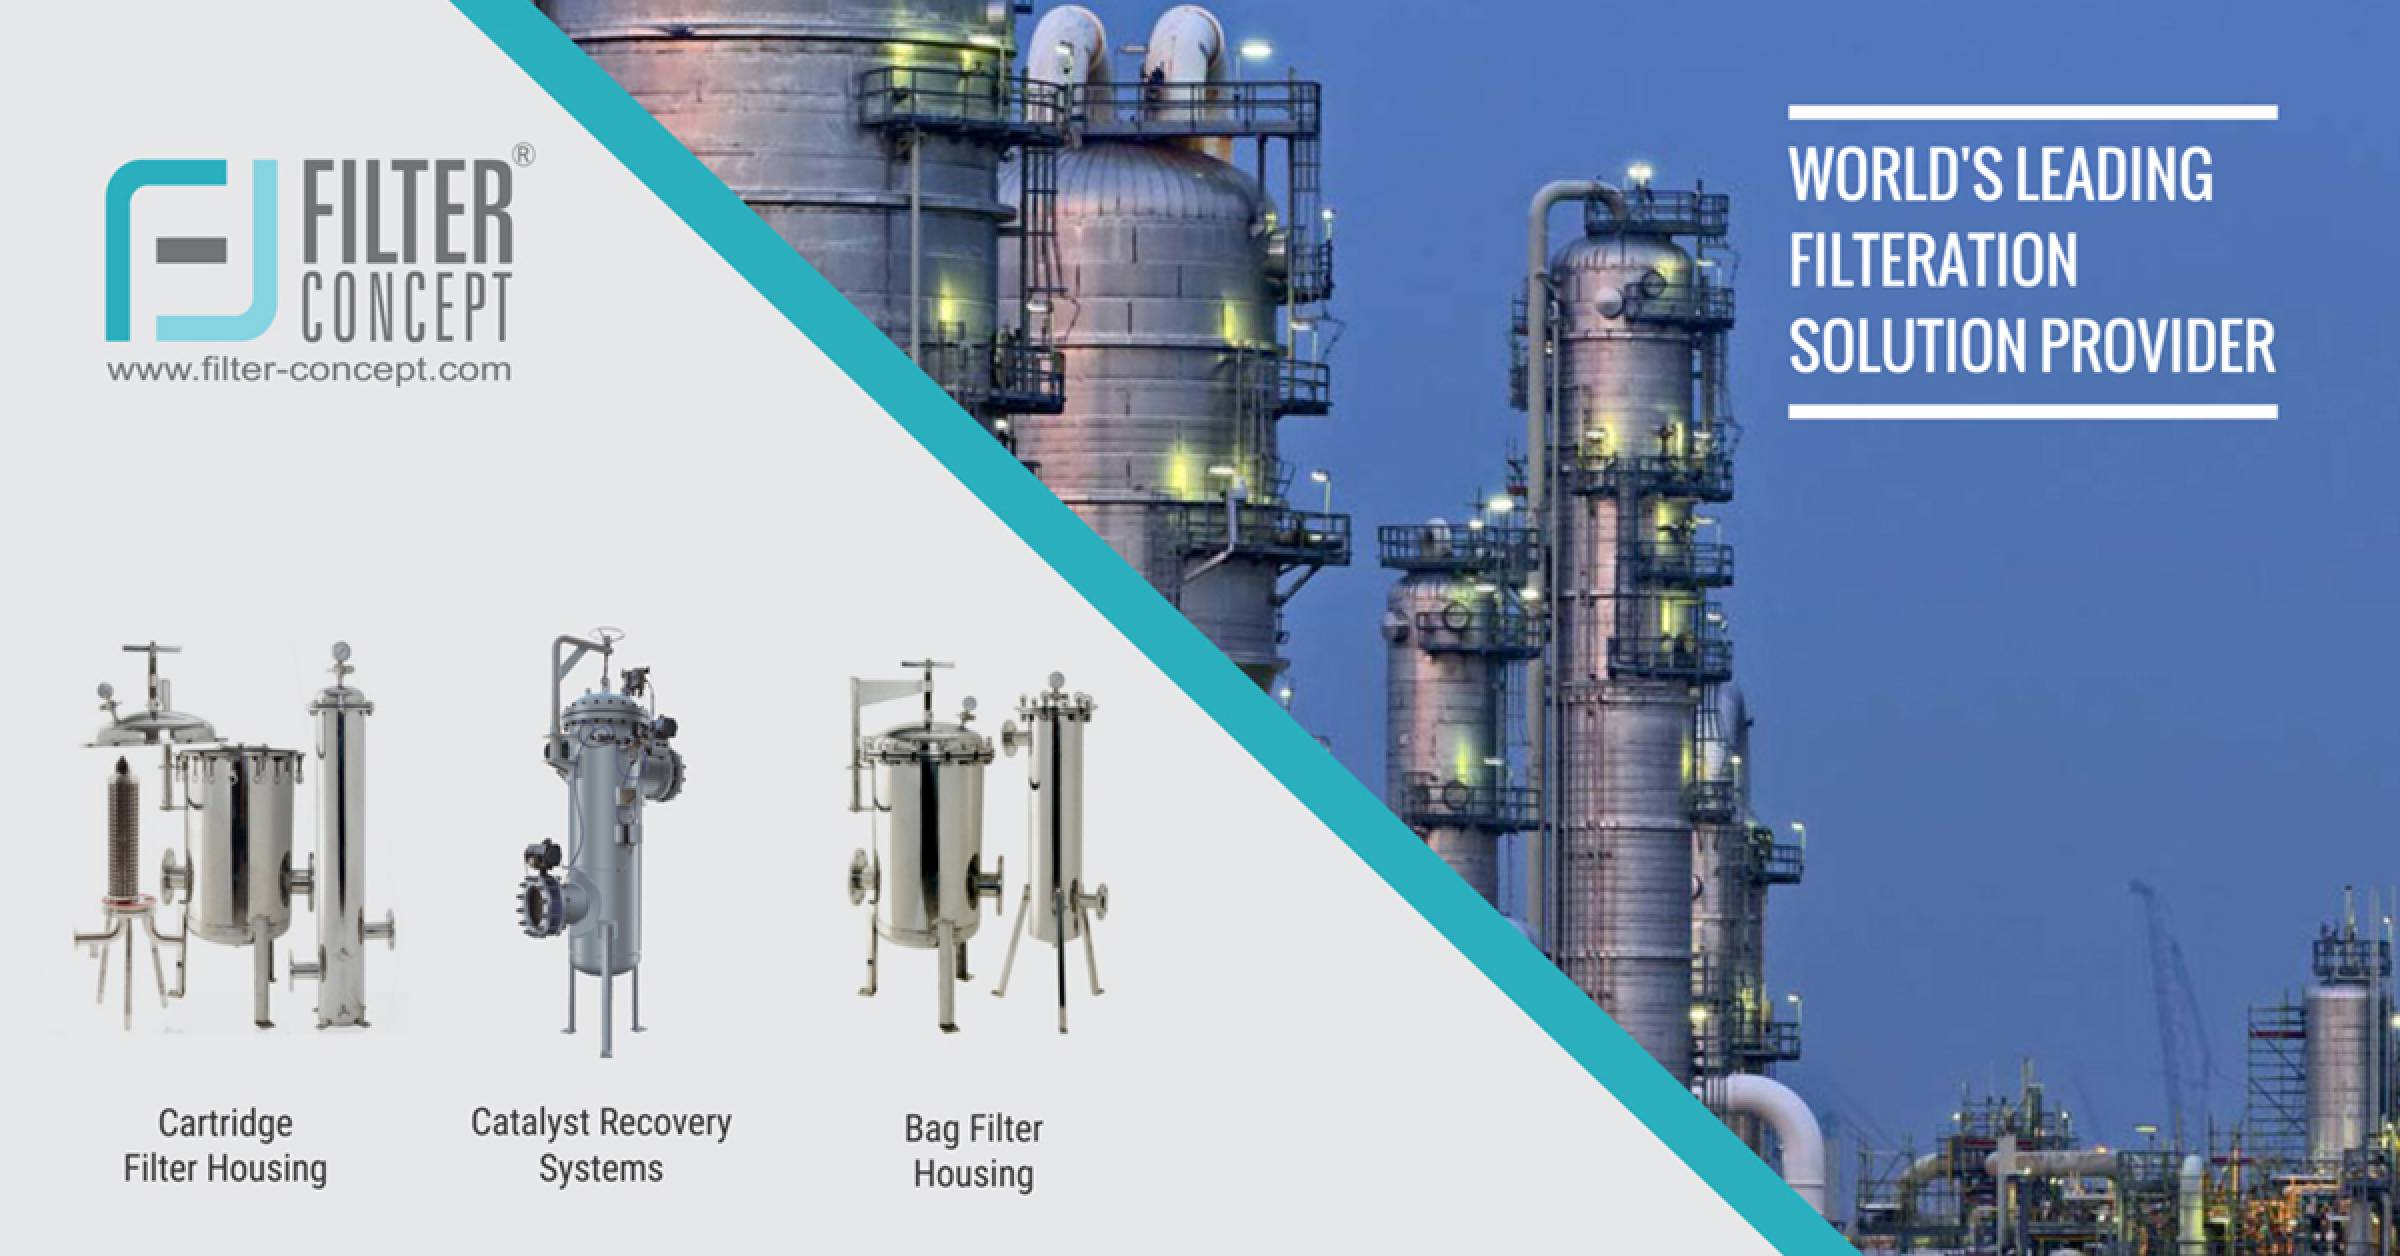 Cartridge Filters, Industrial Filter Manufacturer & Supplier - Filter Concept